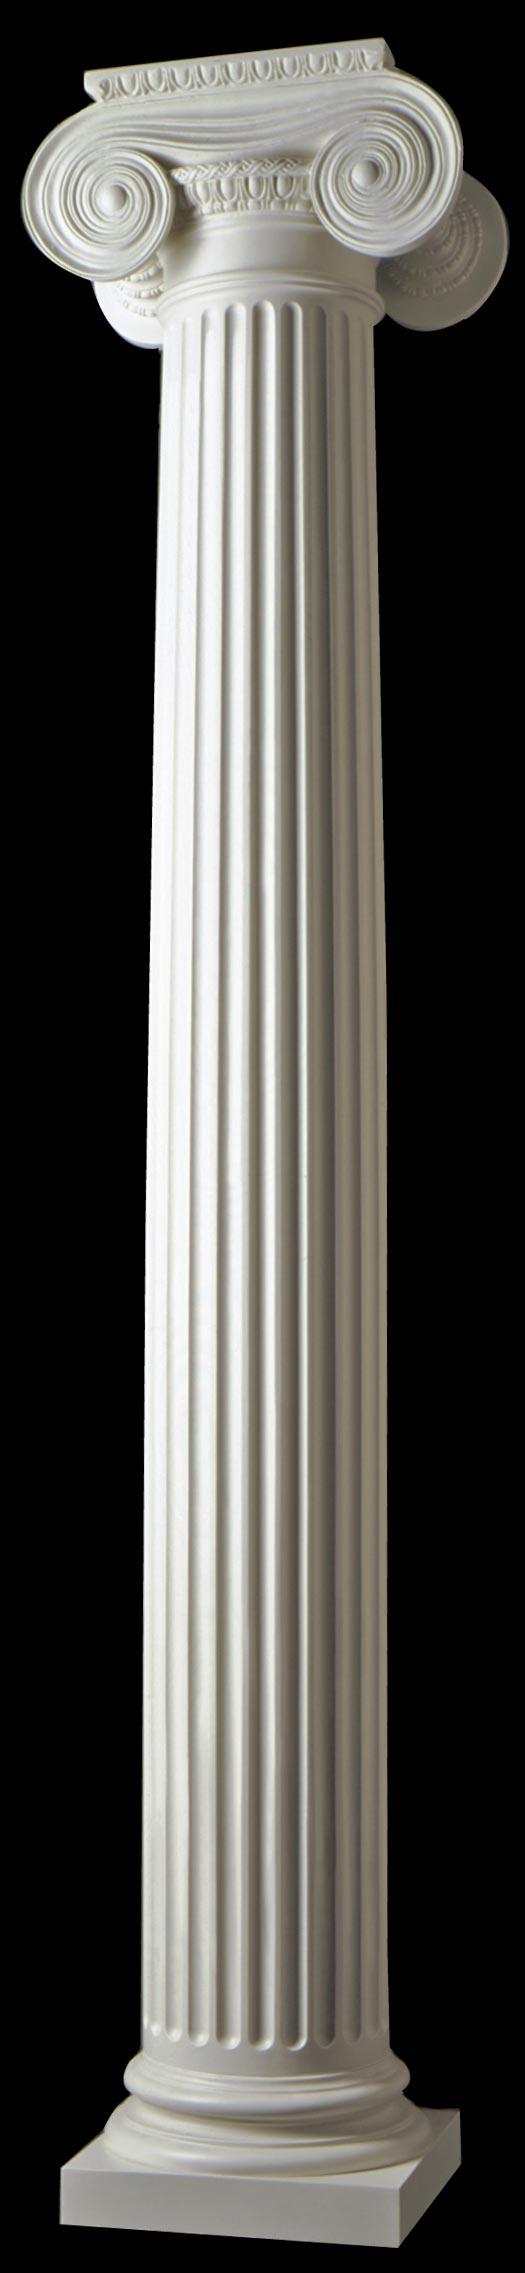 Fluted Composite Columns Round Polystone Greek